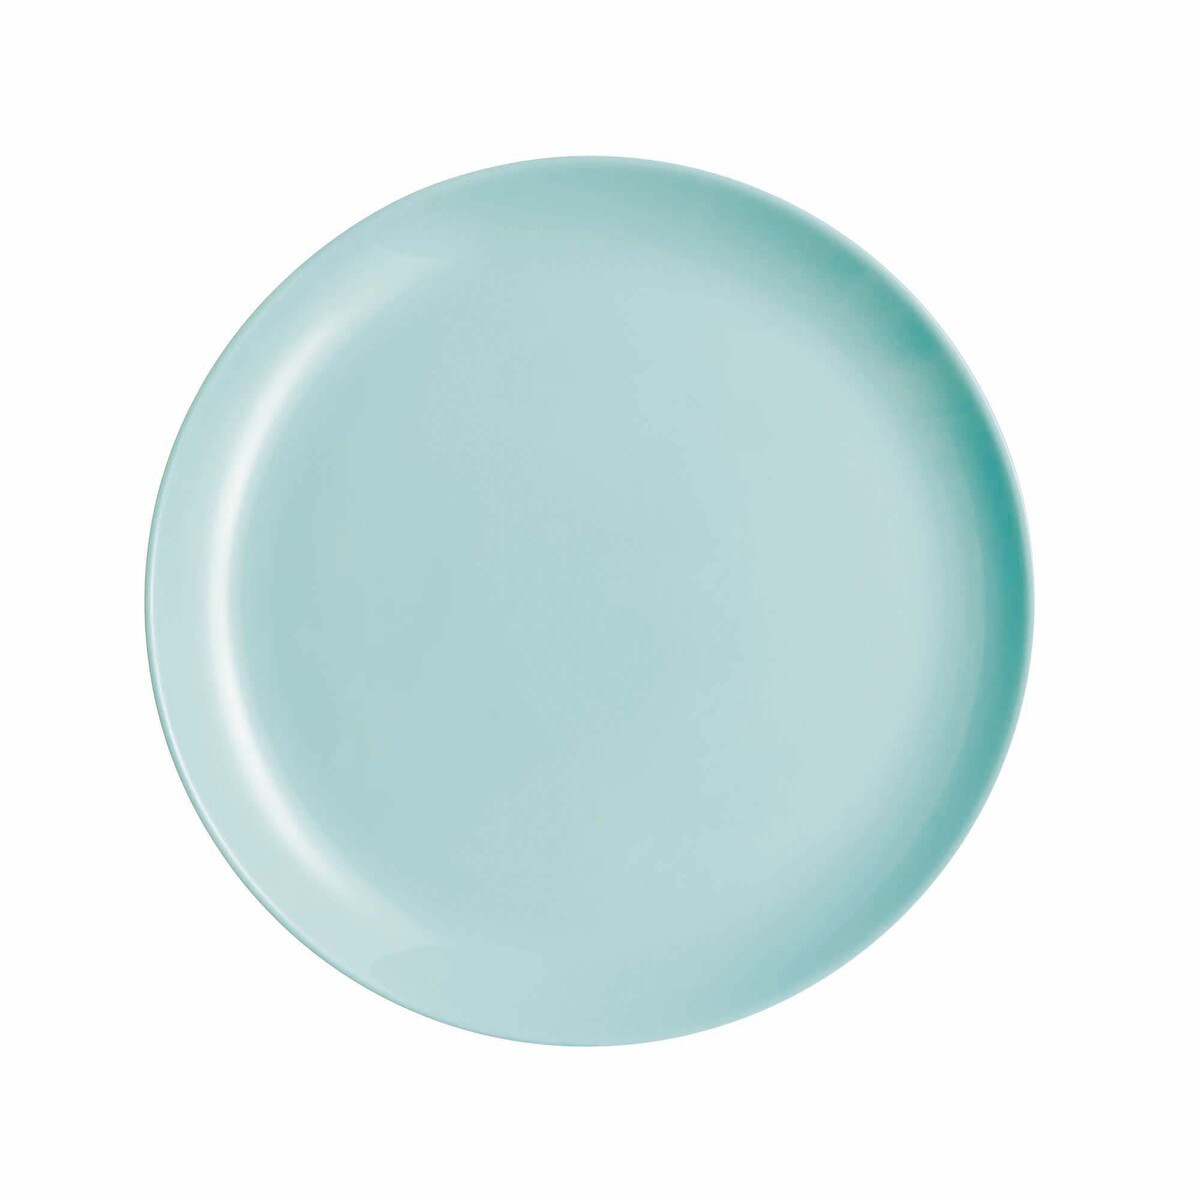 Тарелка подставная Luminarc Diwali Light Turquoise 27 см (P2013)